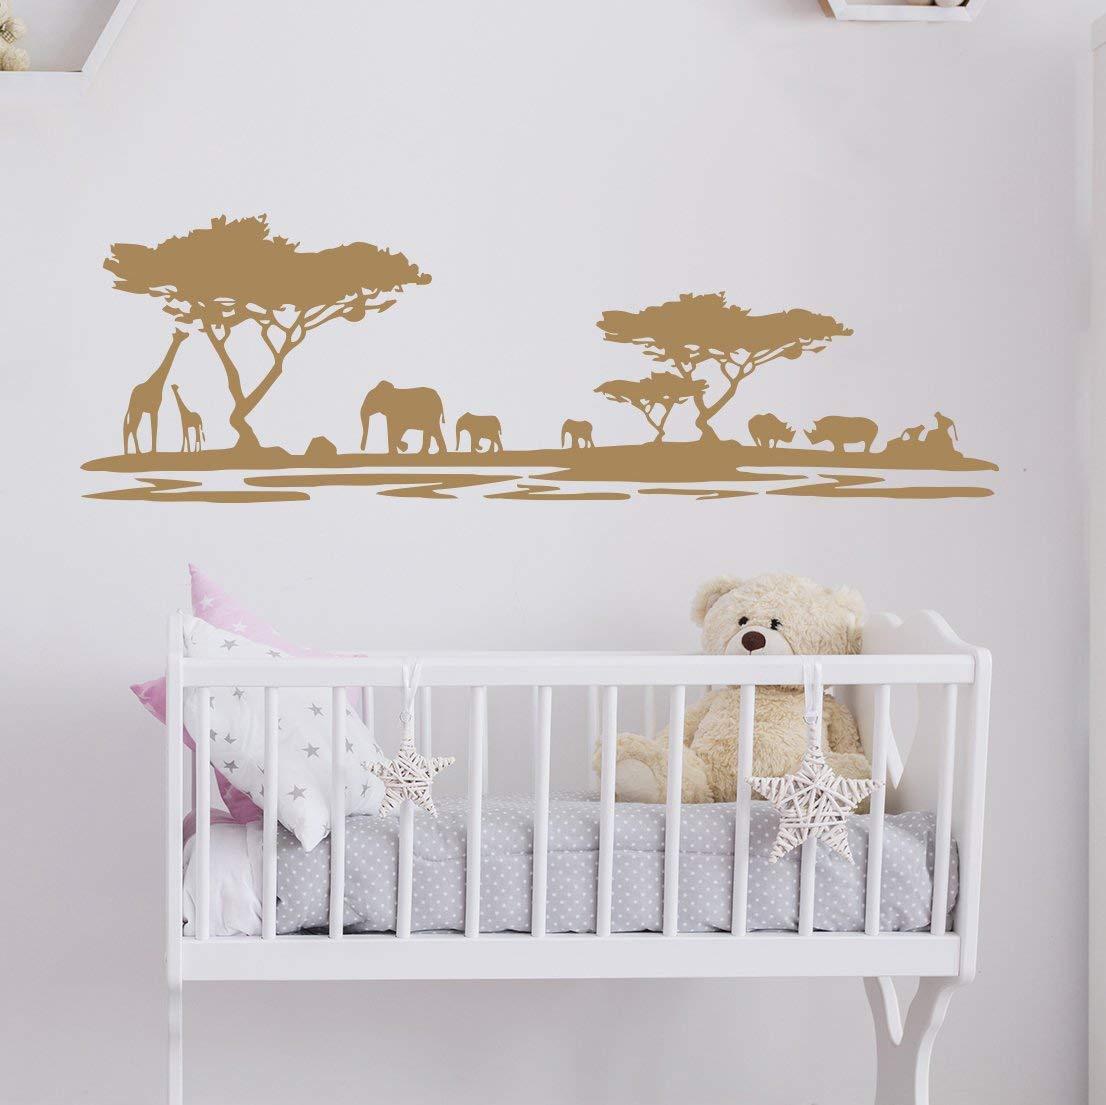 Safari Nursery Wall Decals. Wall Vinyl Sticker Nursery. Nature Wall Decal. Zoo Wall Decor. African Nursery Decor. Giraffe Elephant Decal kp25